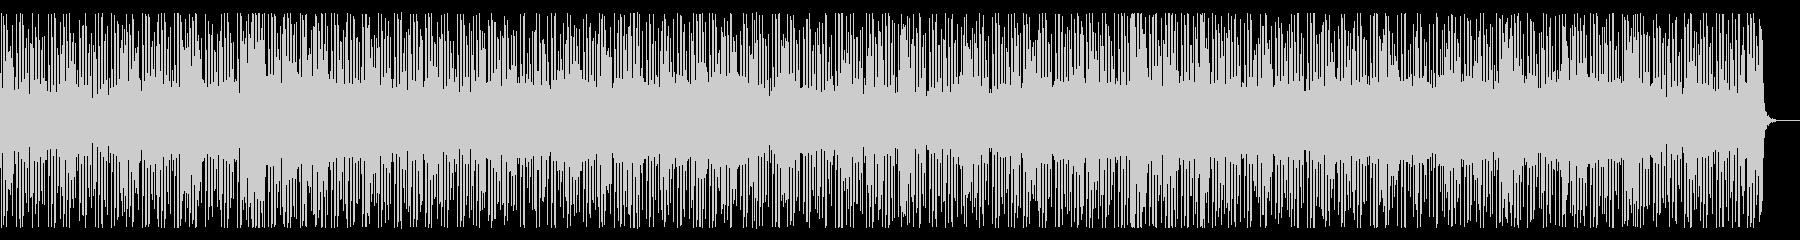 News program / news / serious's unreproduced waveform